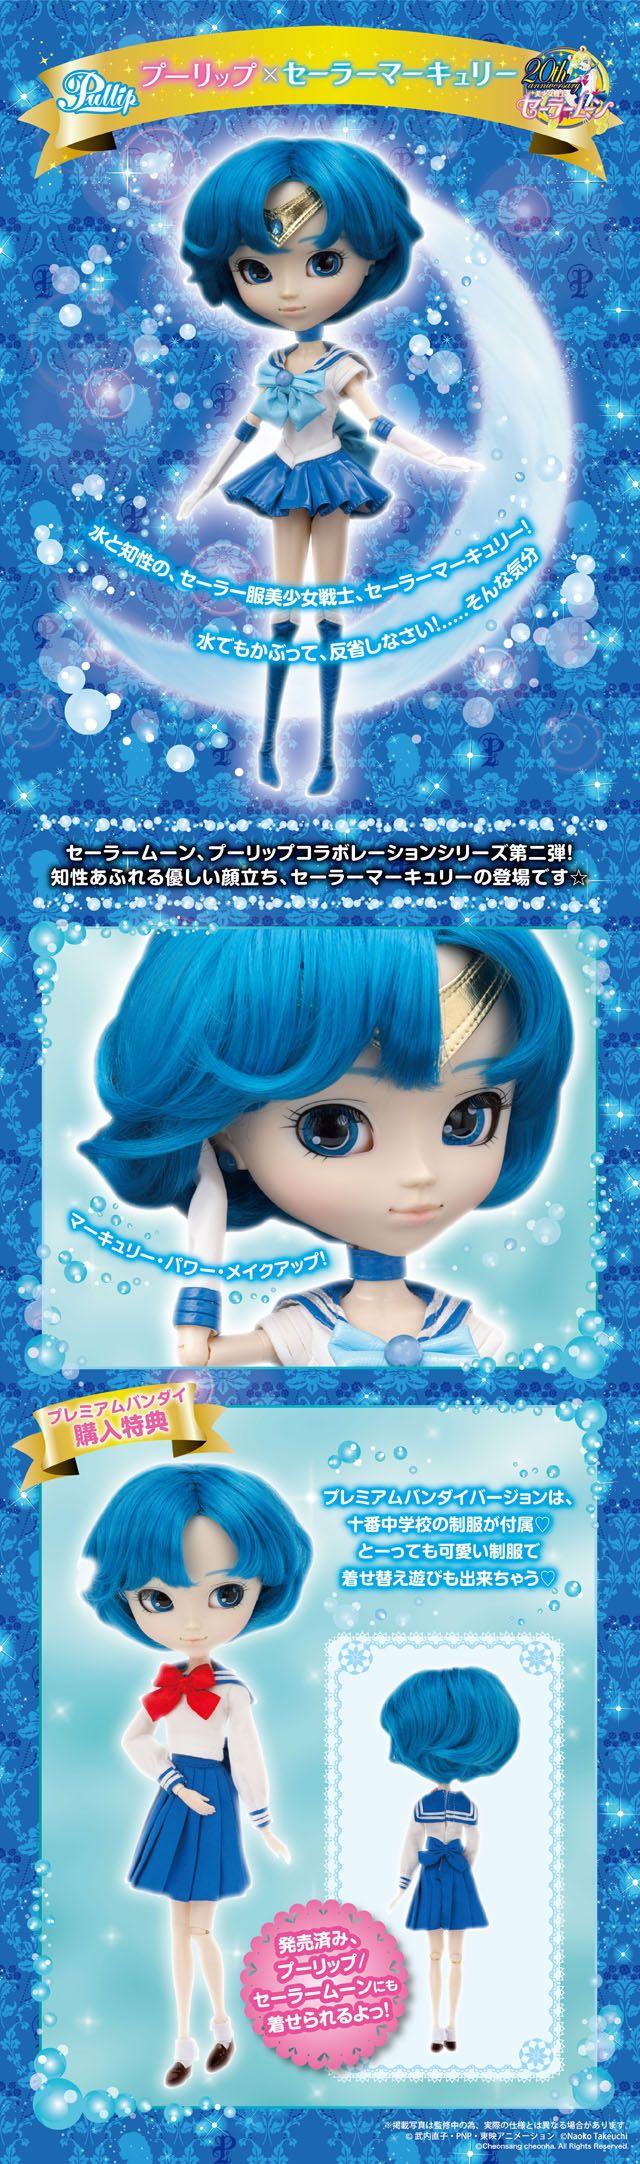 Sailor Moon Sailor Mercury Pullip doll with preorder